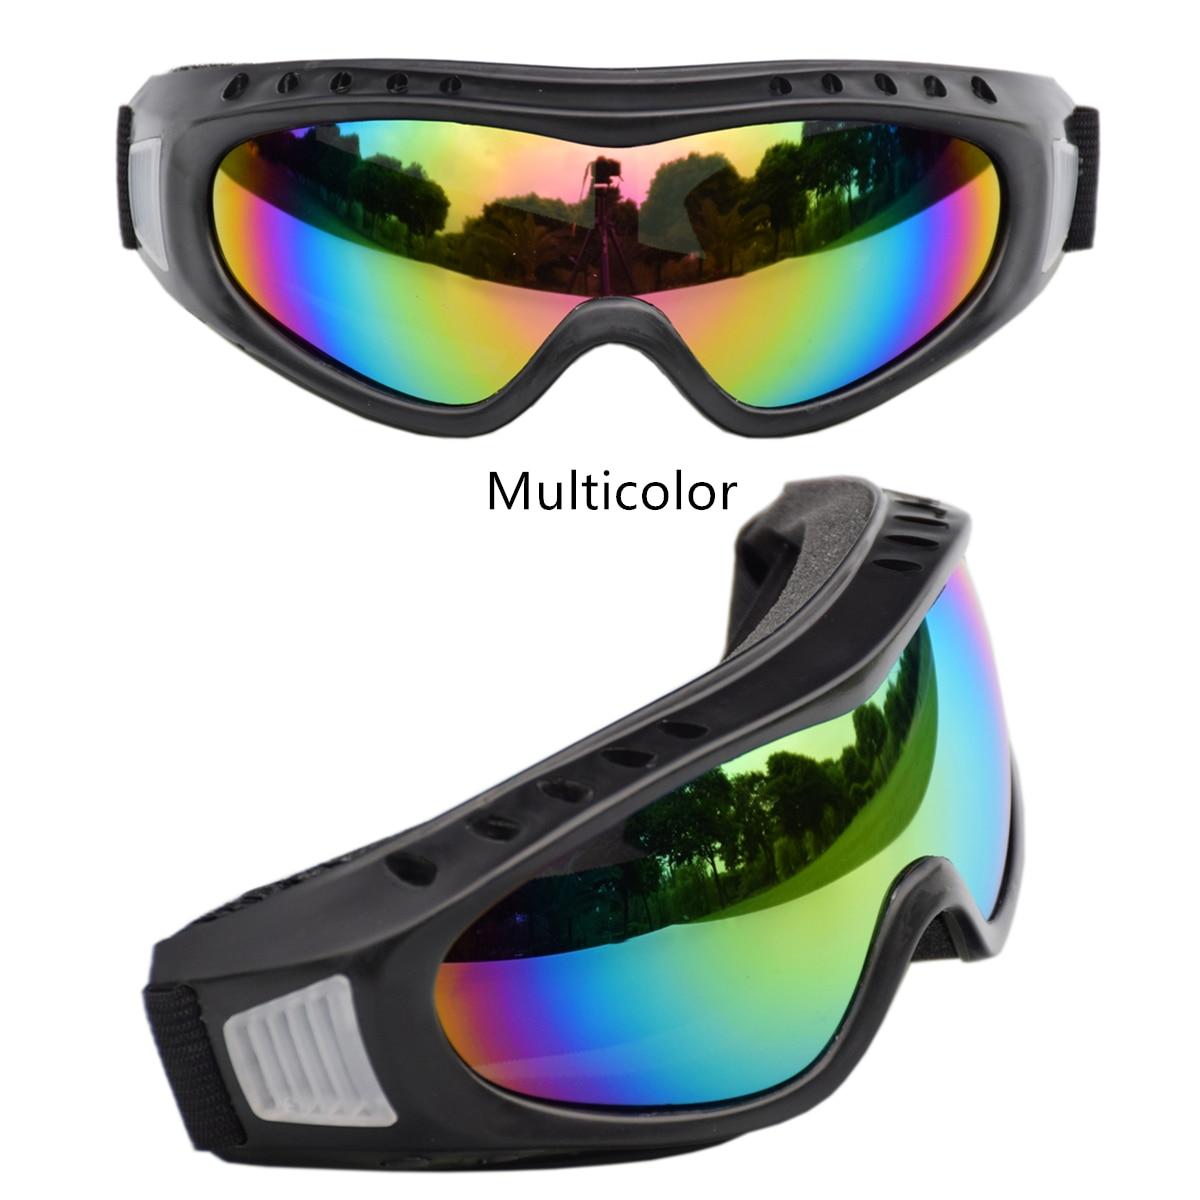 Anti-UV Ski Snowboard Goggles Sunglasses Eyewear Windproof Sports Equipment Professional Winter Ski Goggles For Kids Children